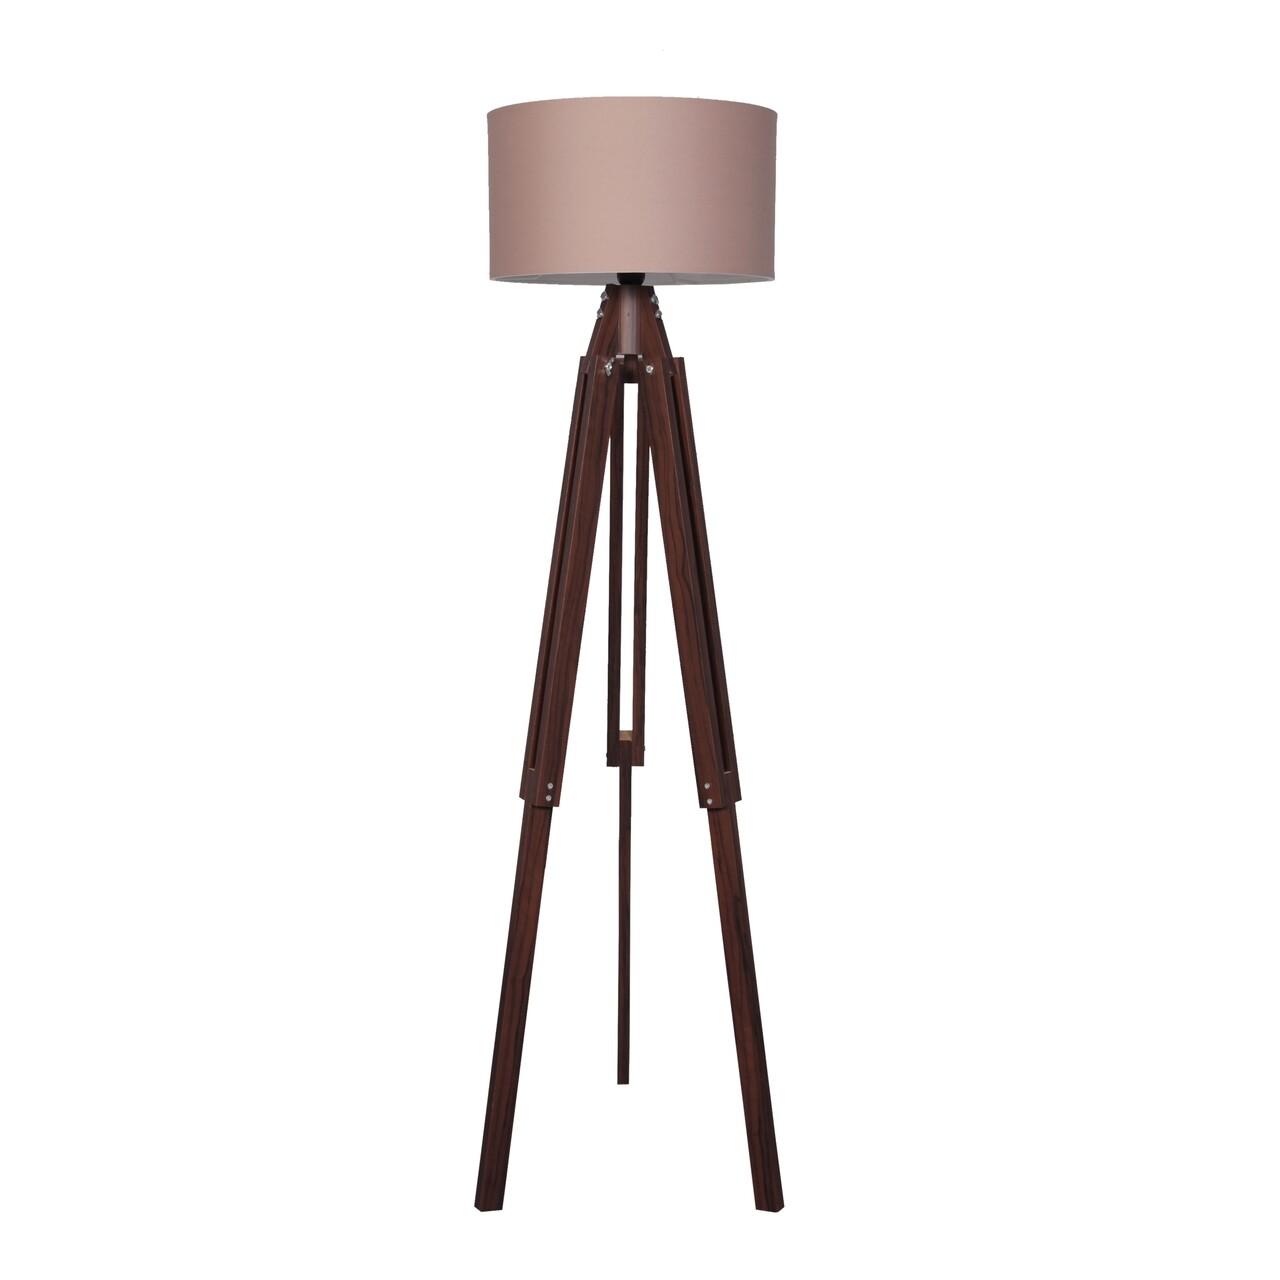 Lampadar Casa Parasio, 38x145 cm, 1 x E27, 60 W, maro